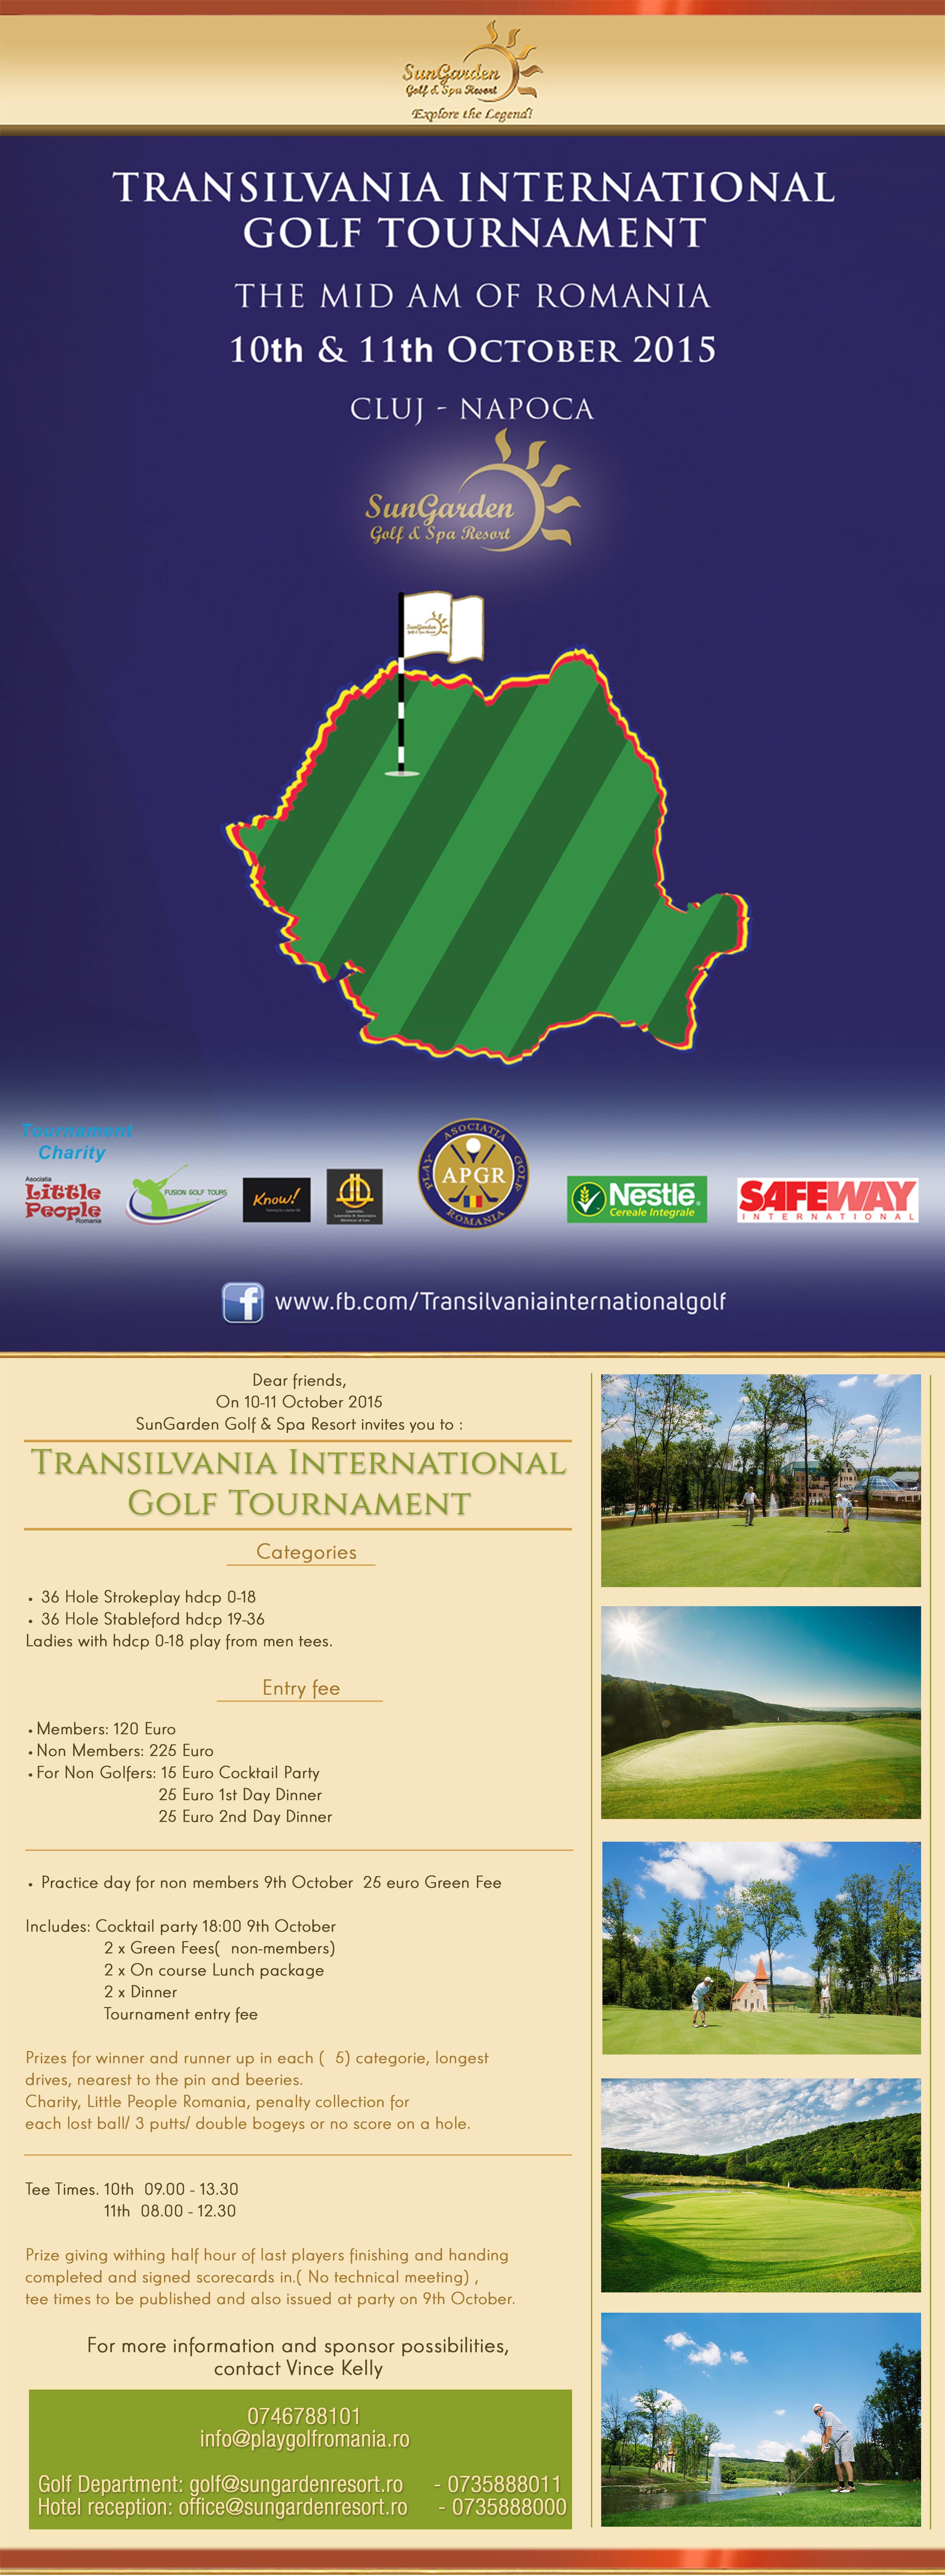 10-11 octombrie Transilvania International Golf Tournament (The Mid- Am of Romania) - Sun Garden Resort